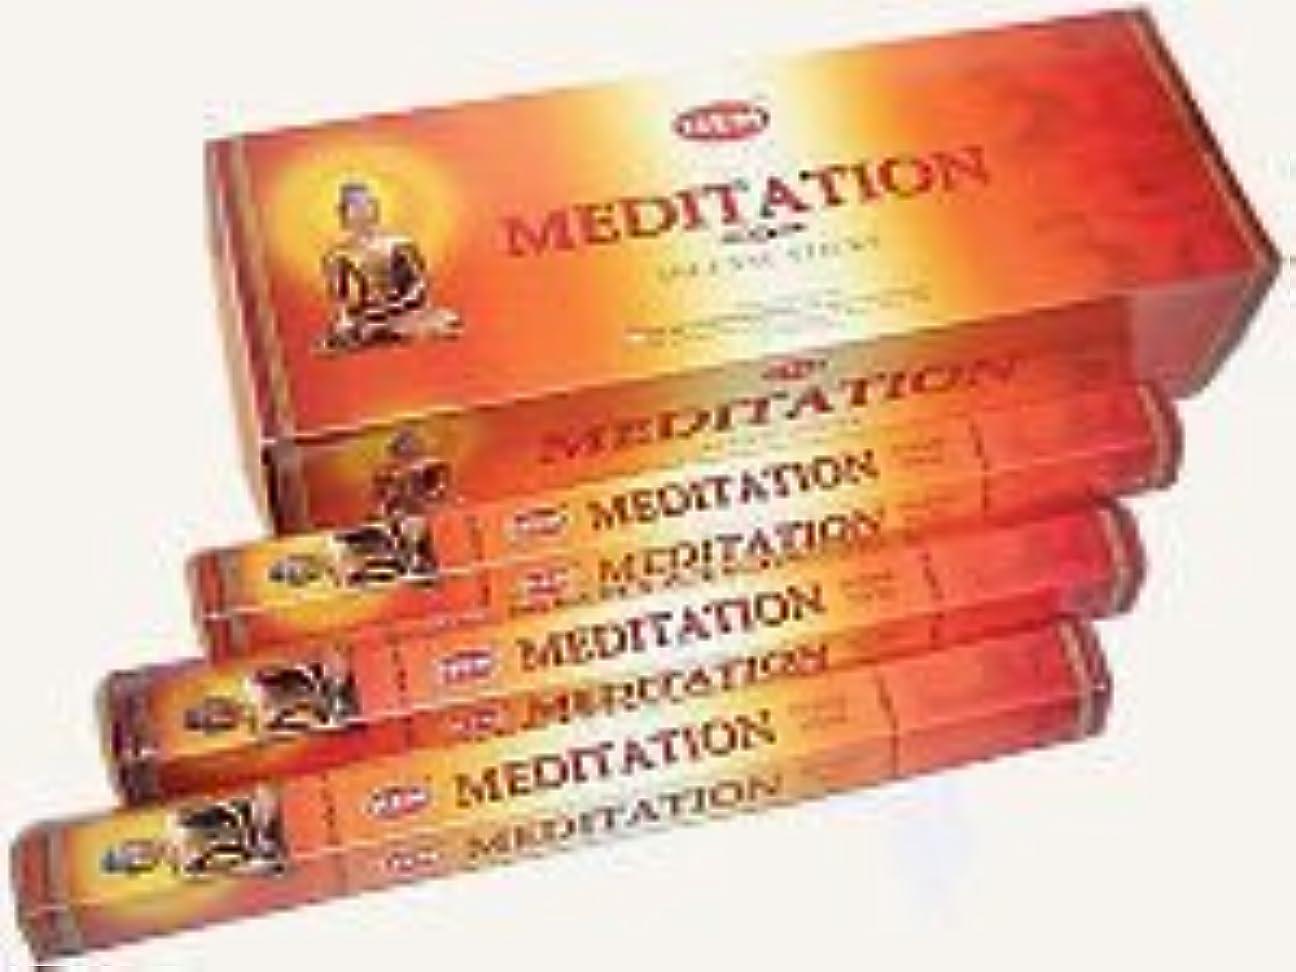 Hem Meditation Incense Sticks 120ct [並行輸入品]